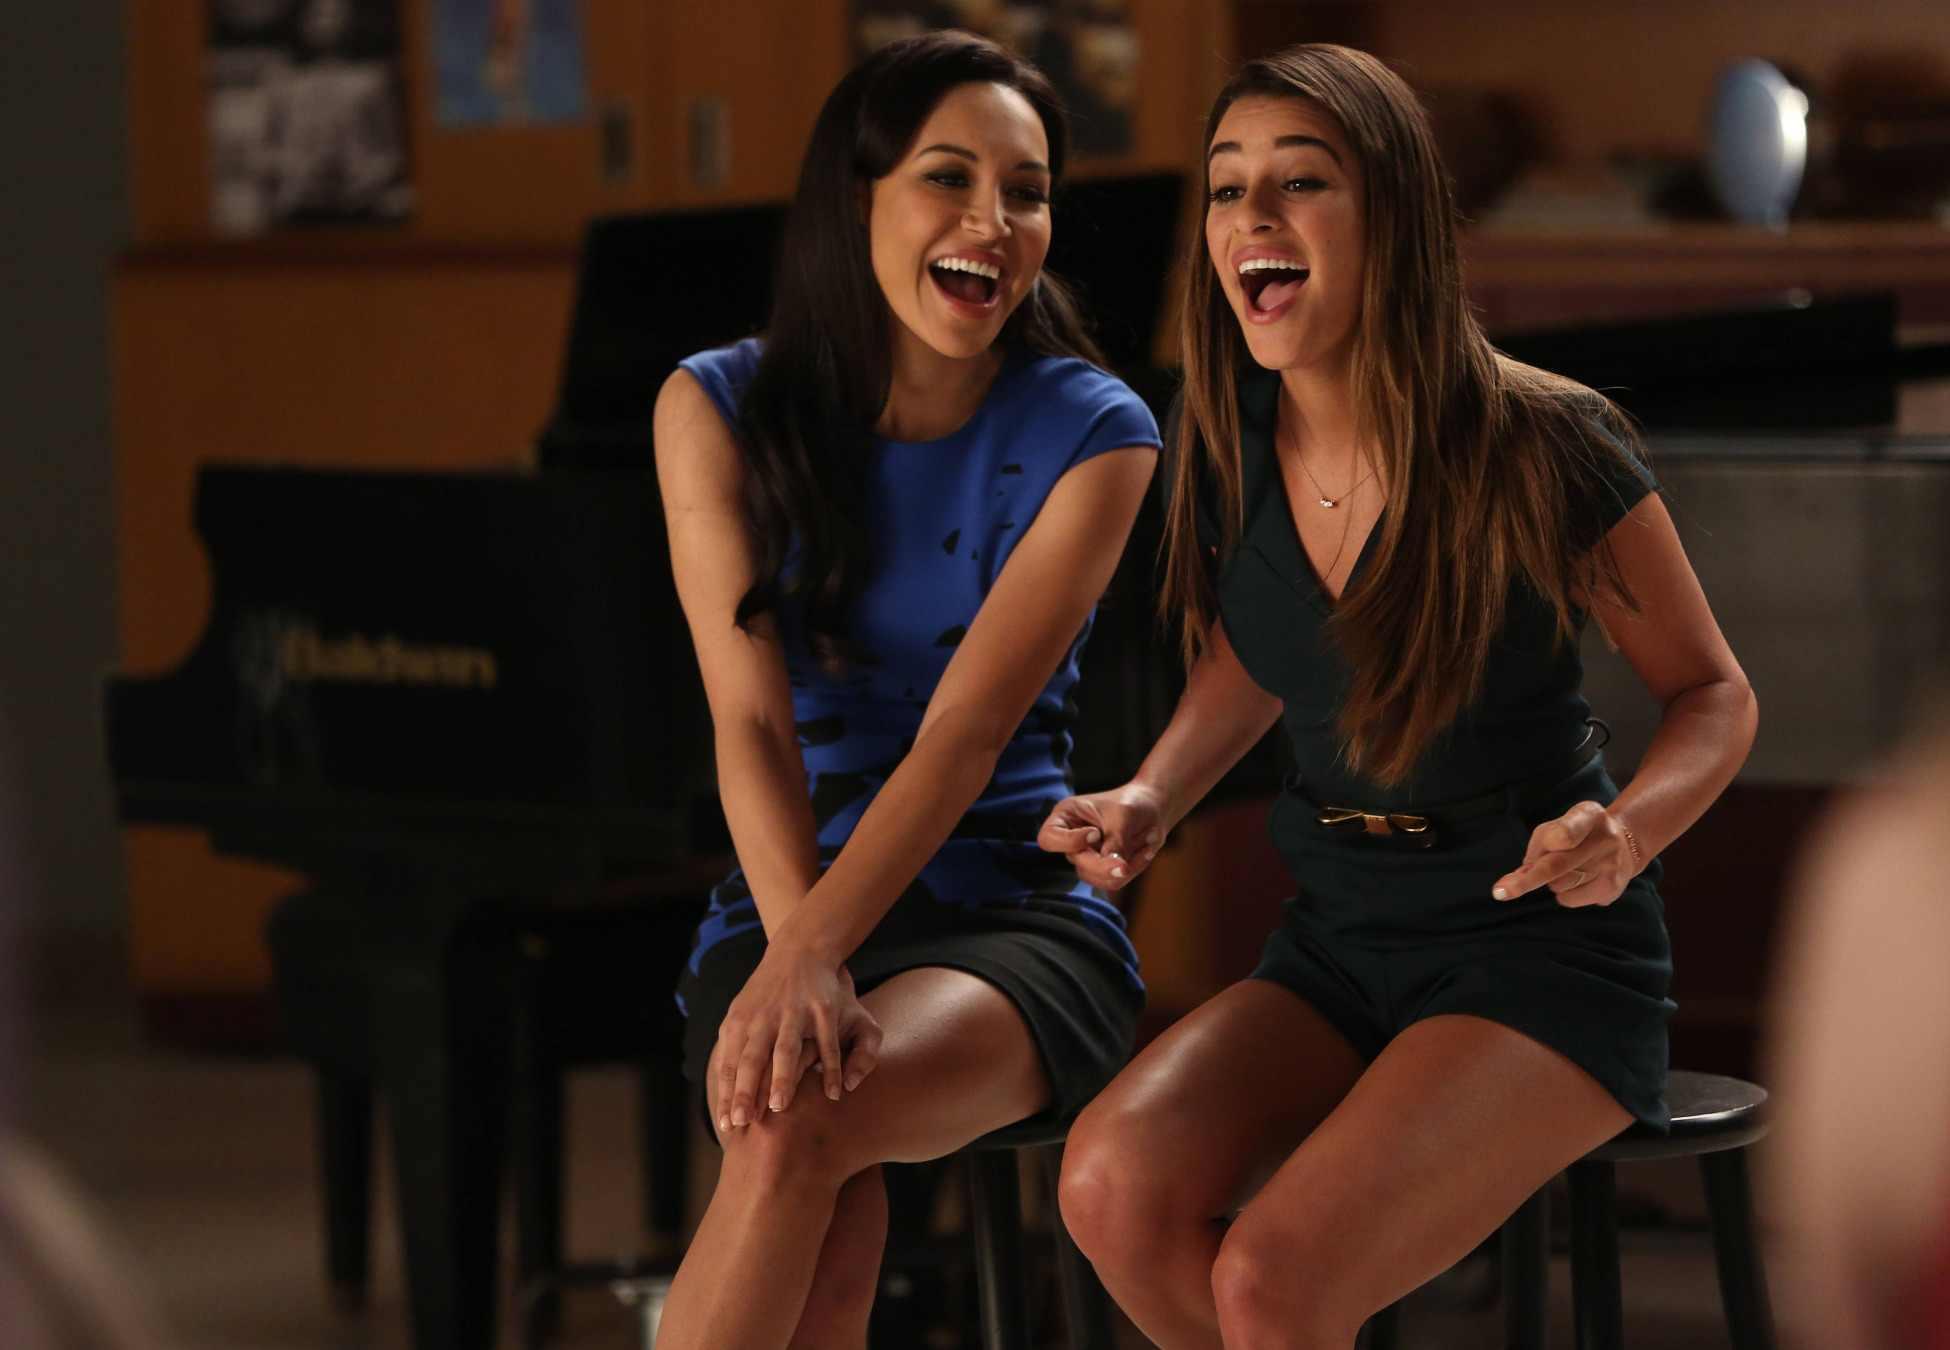 Santana (Naya Rivera) e Lea Michele (Rachel) em Glee